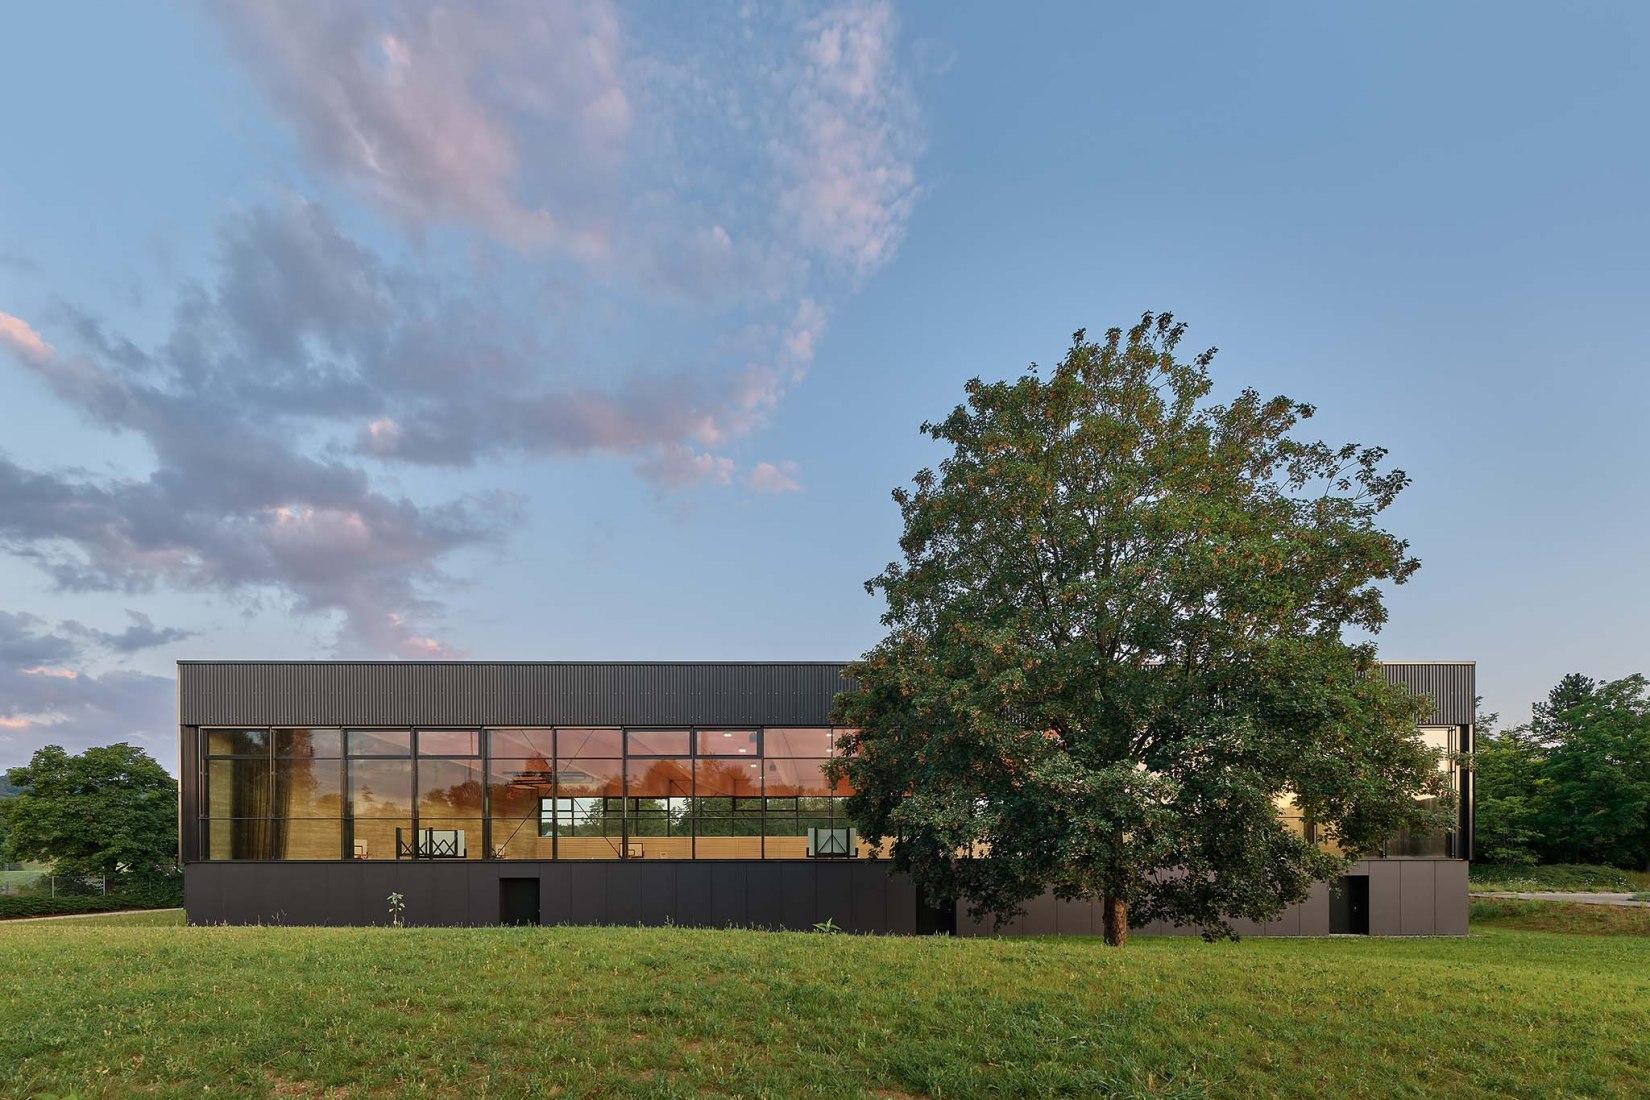 Triple-field sports hall by DREI ARCHITEKTEN. Photograph by Zooey Braun